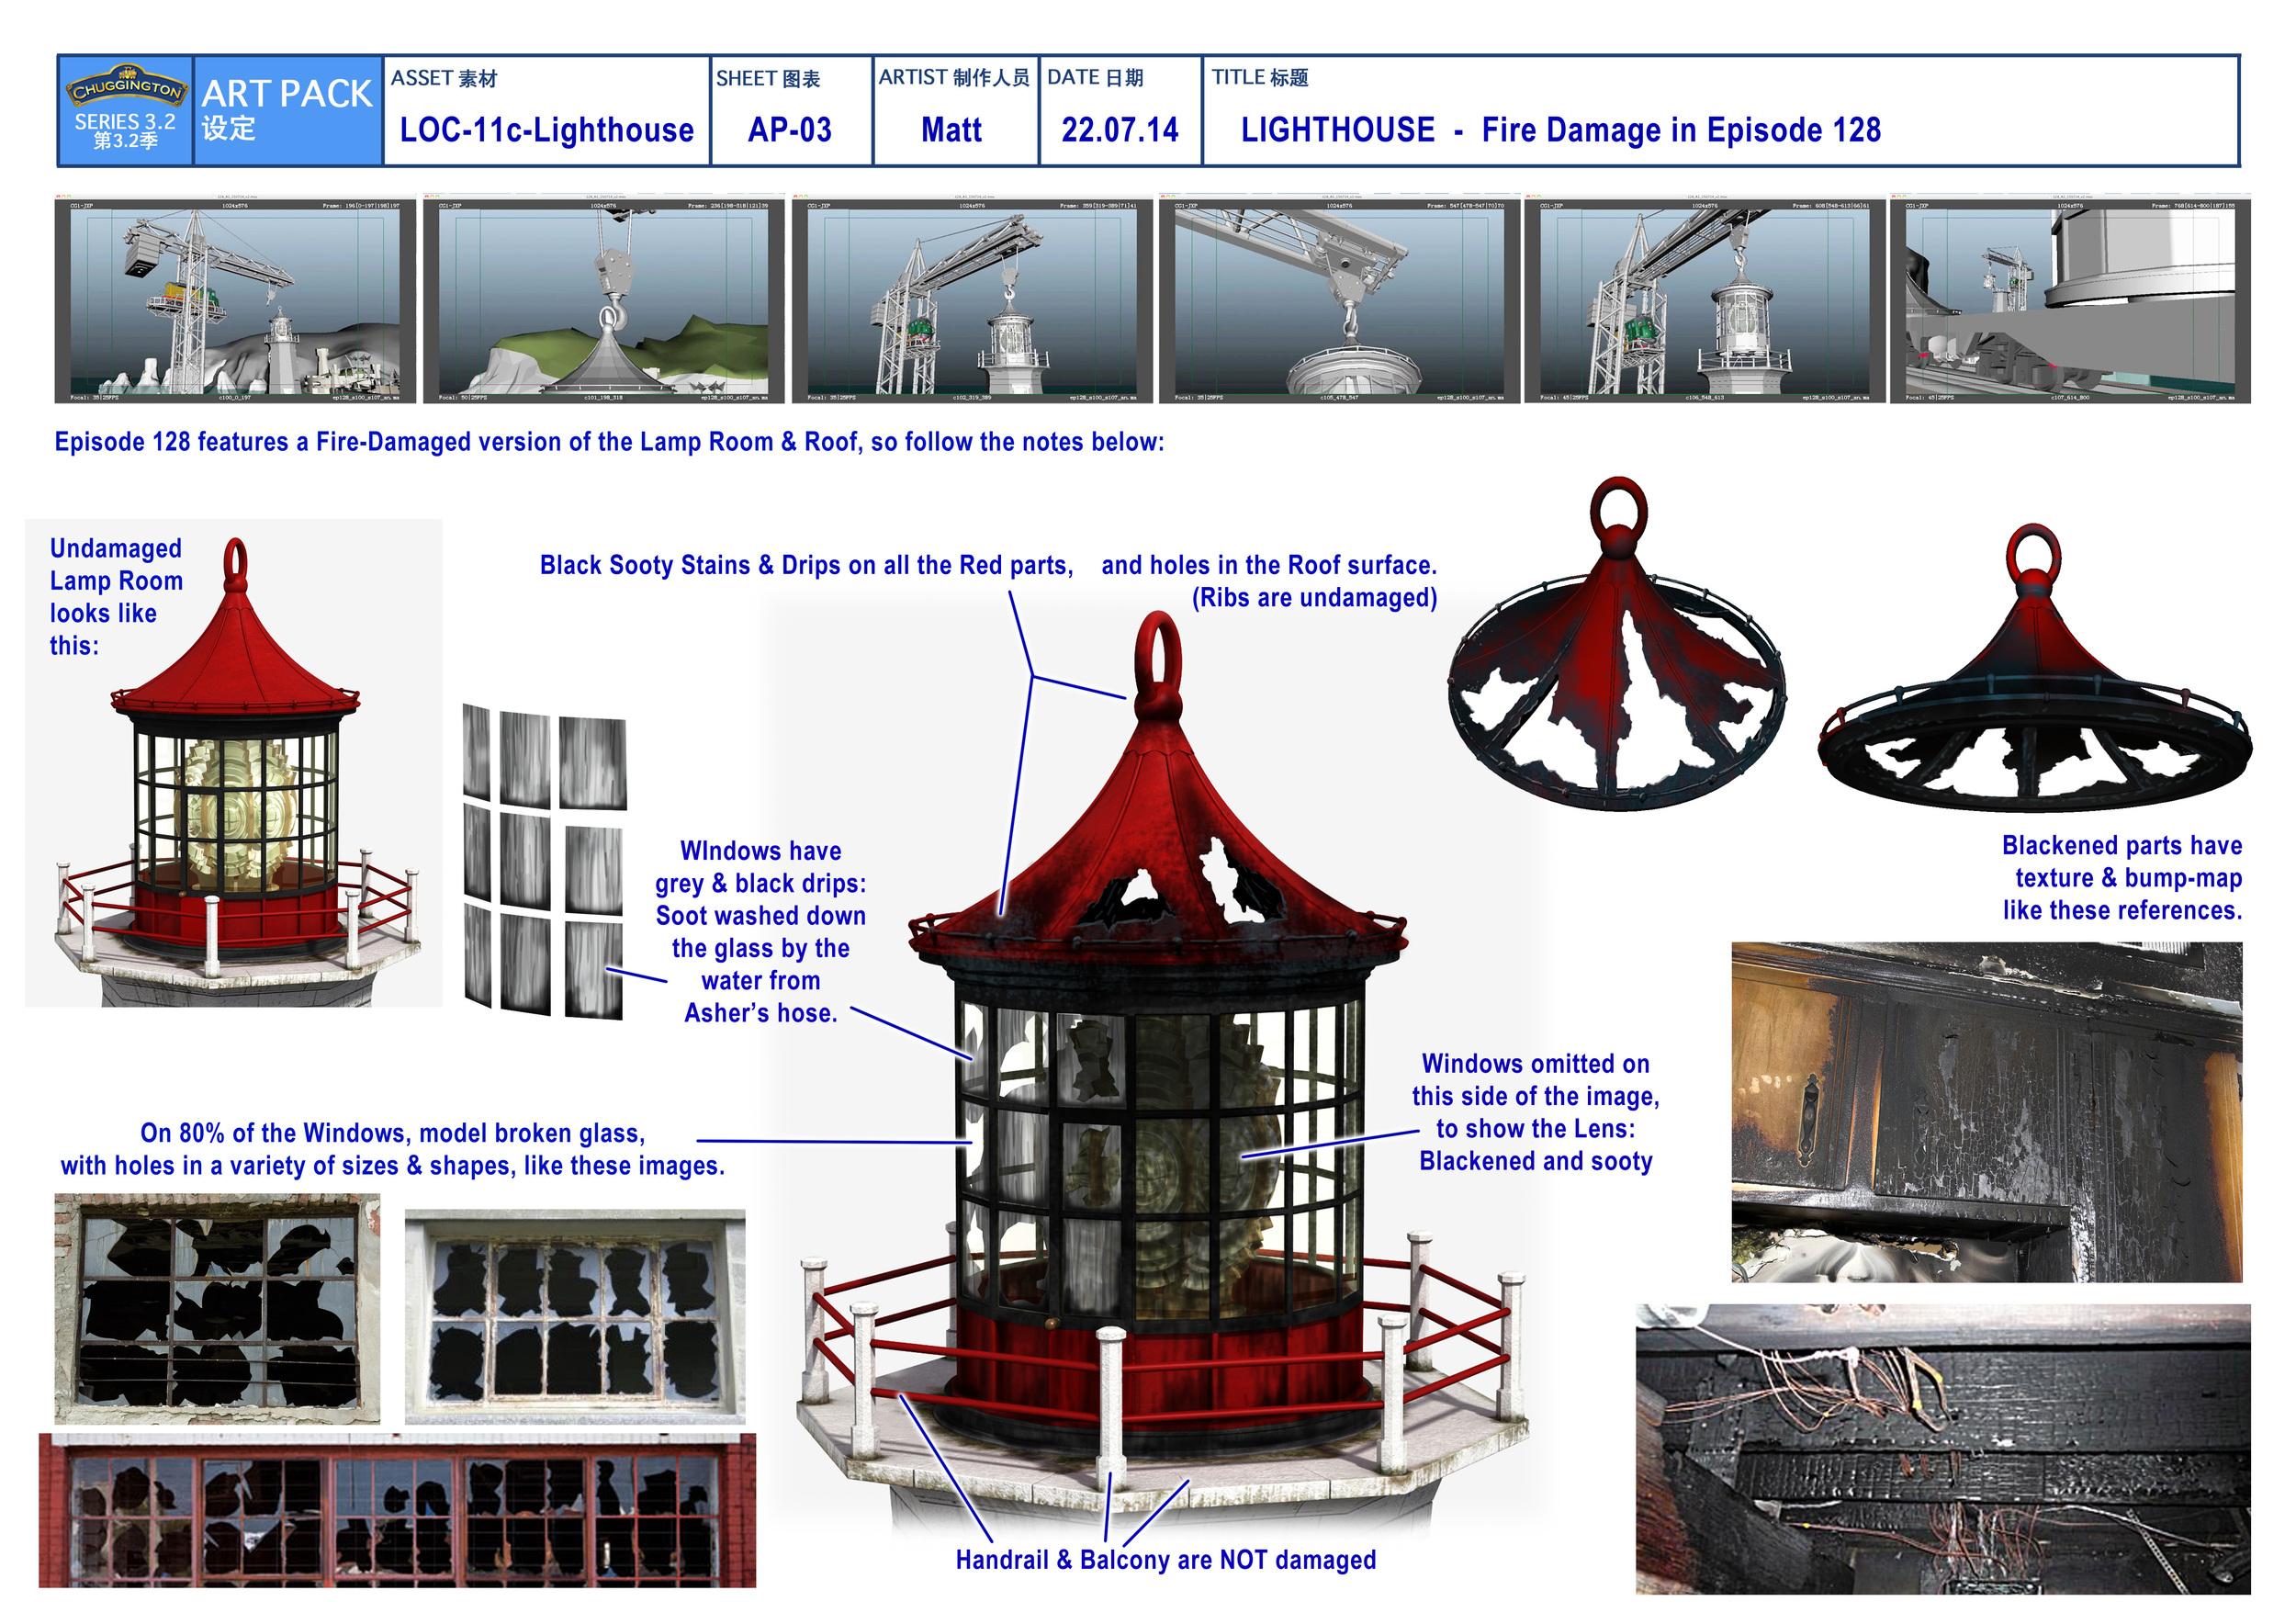 LOC-Lighthouse_AP-03_2014-07-23.jpg